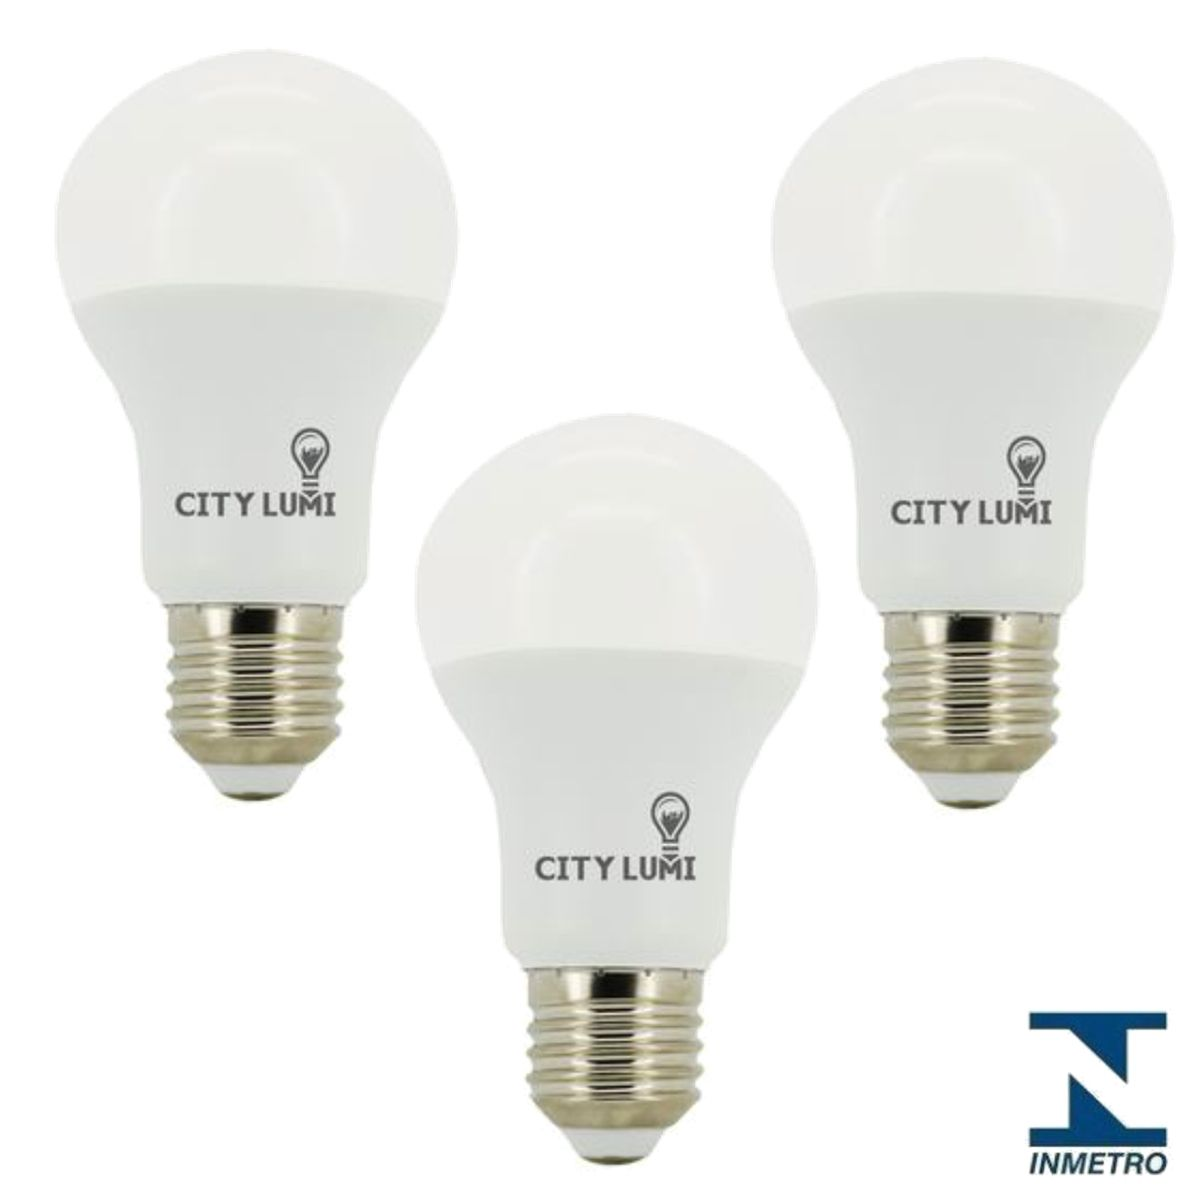 Kit 3 Lampada LED Bulbo Autodimerizavel 3 Tons 12W City Lumi